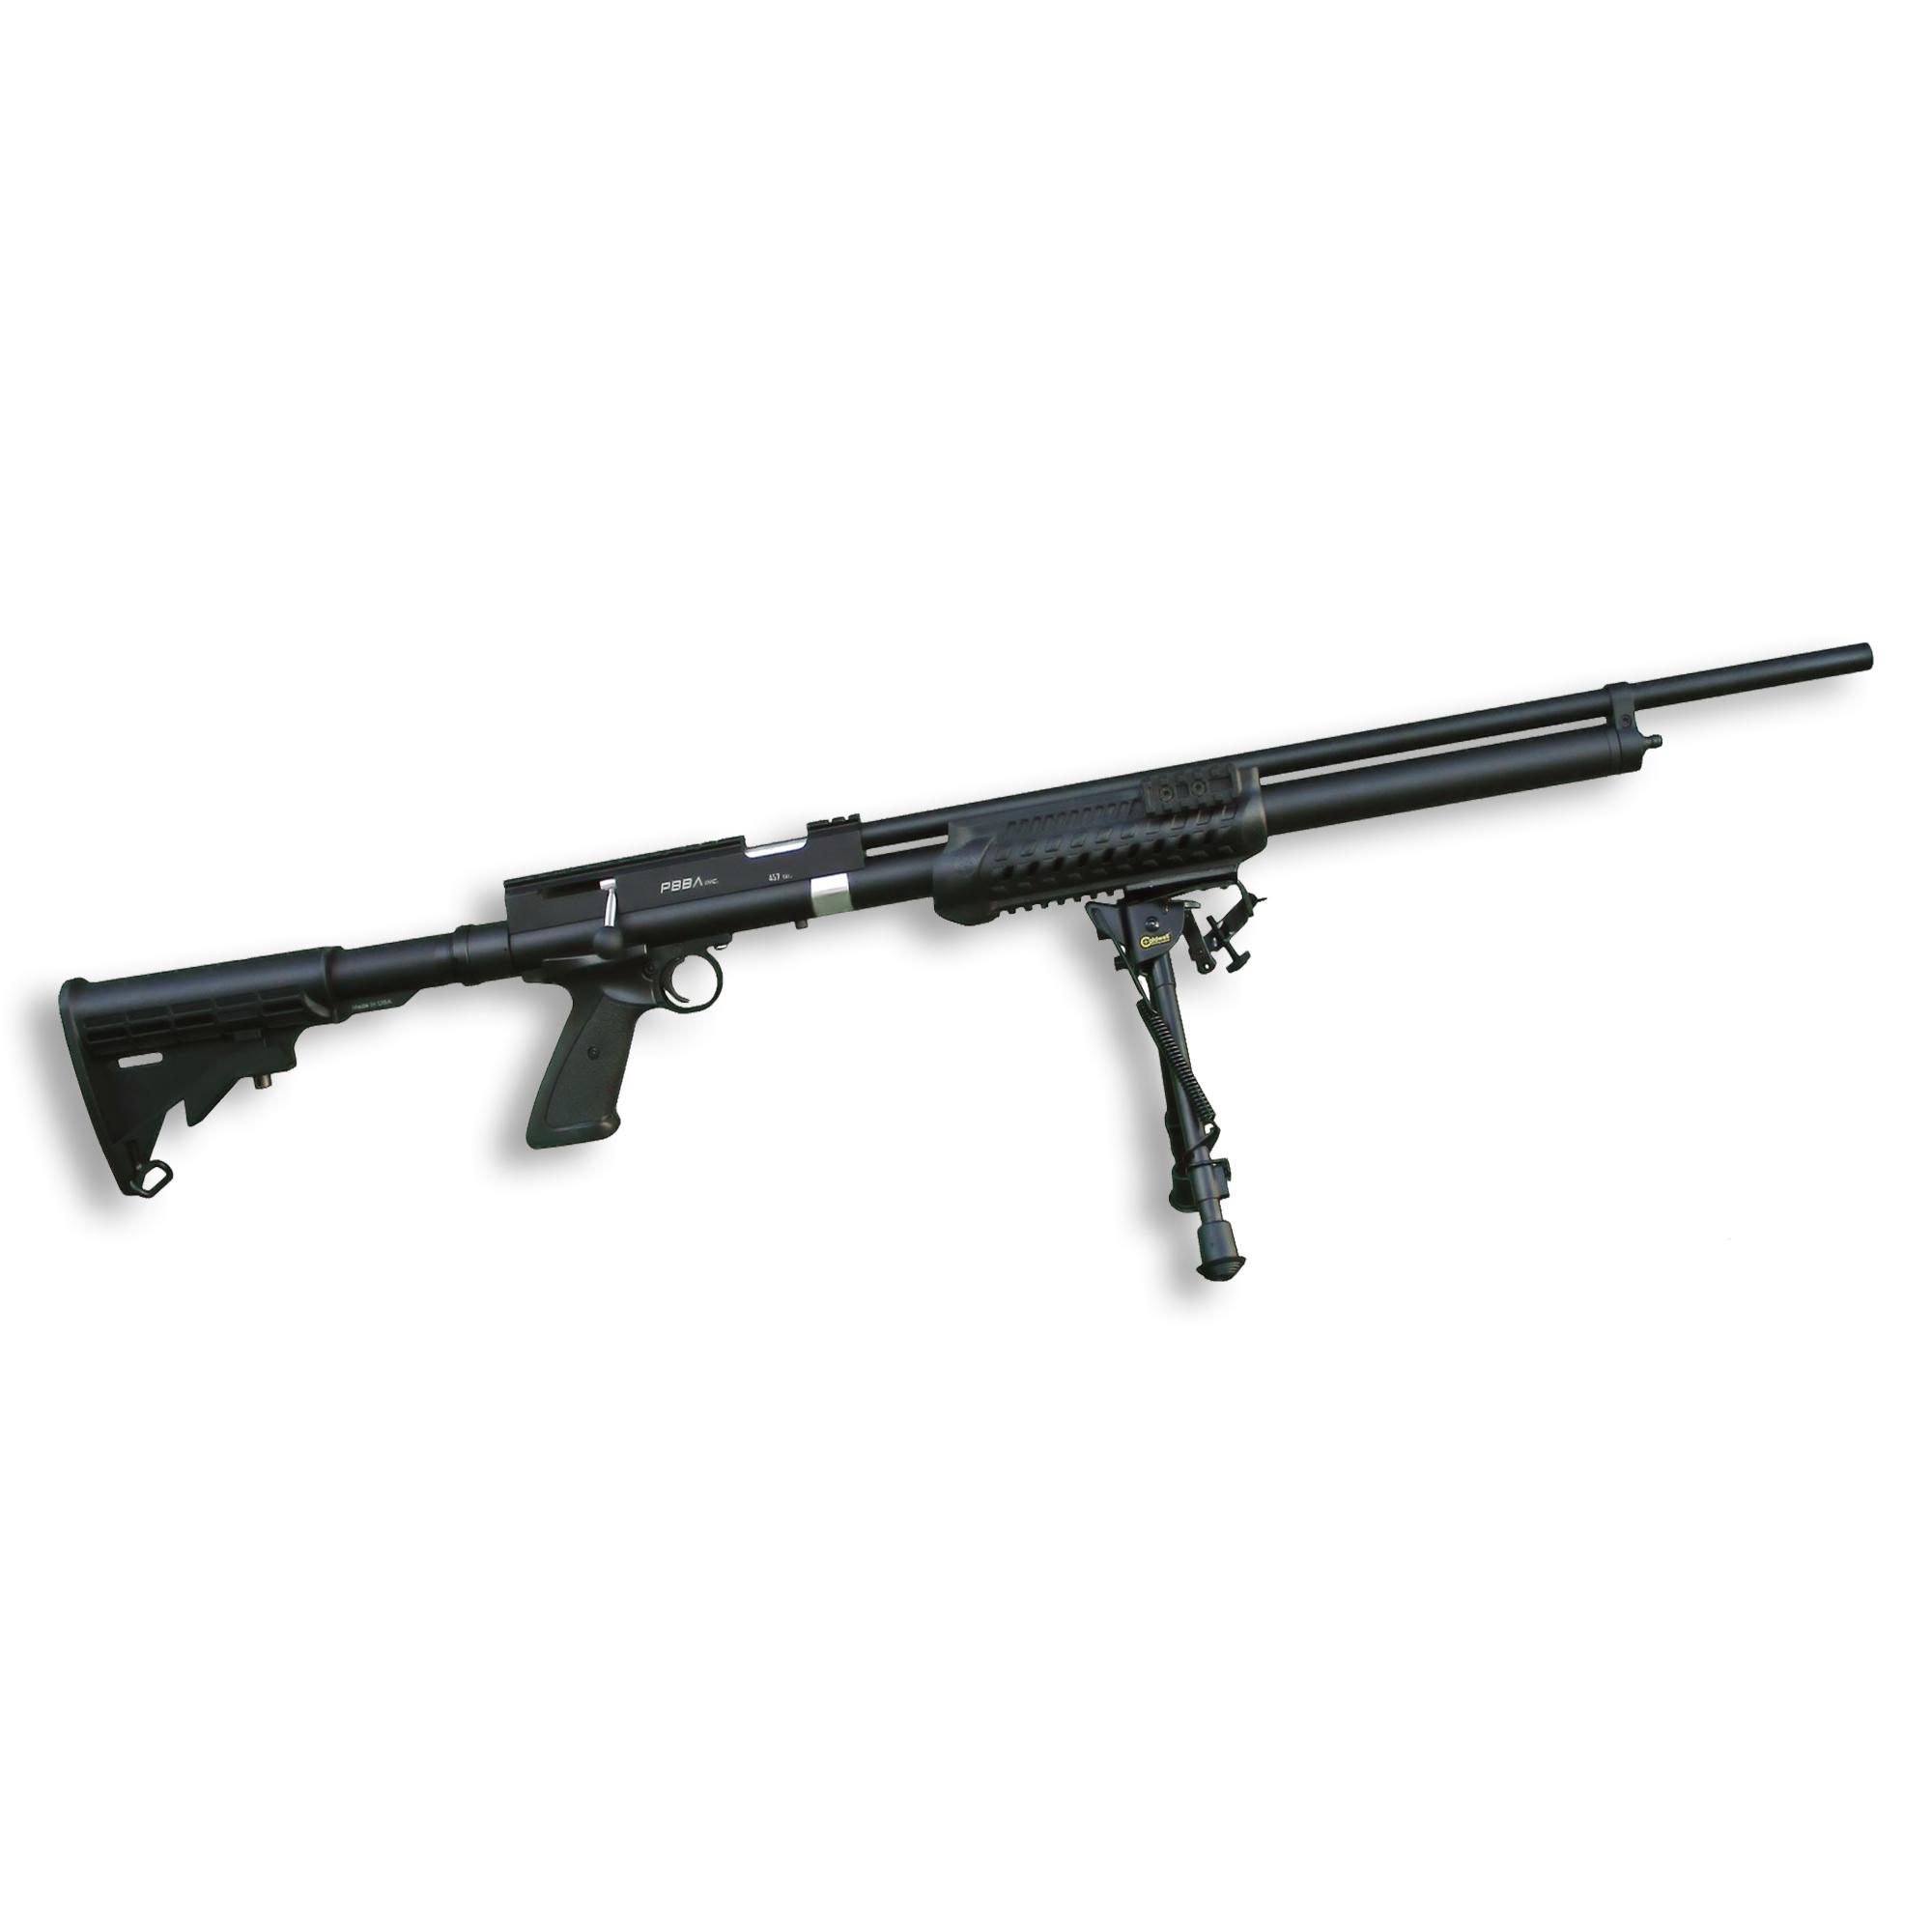 Pro AR Air Rifle